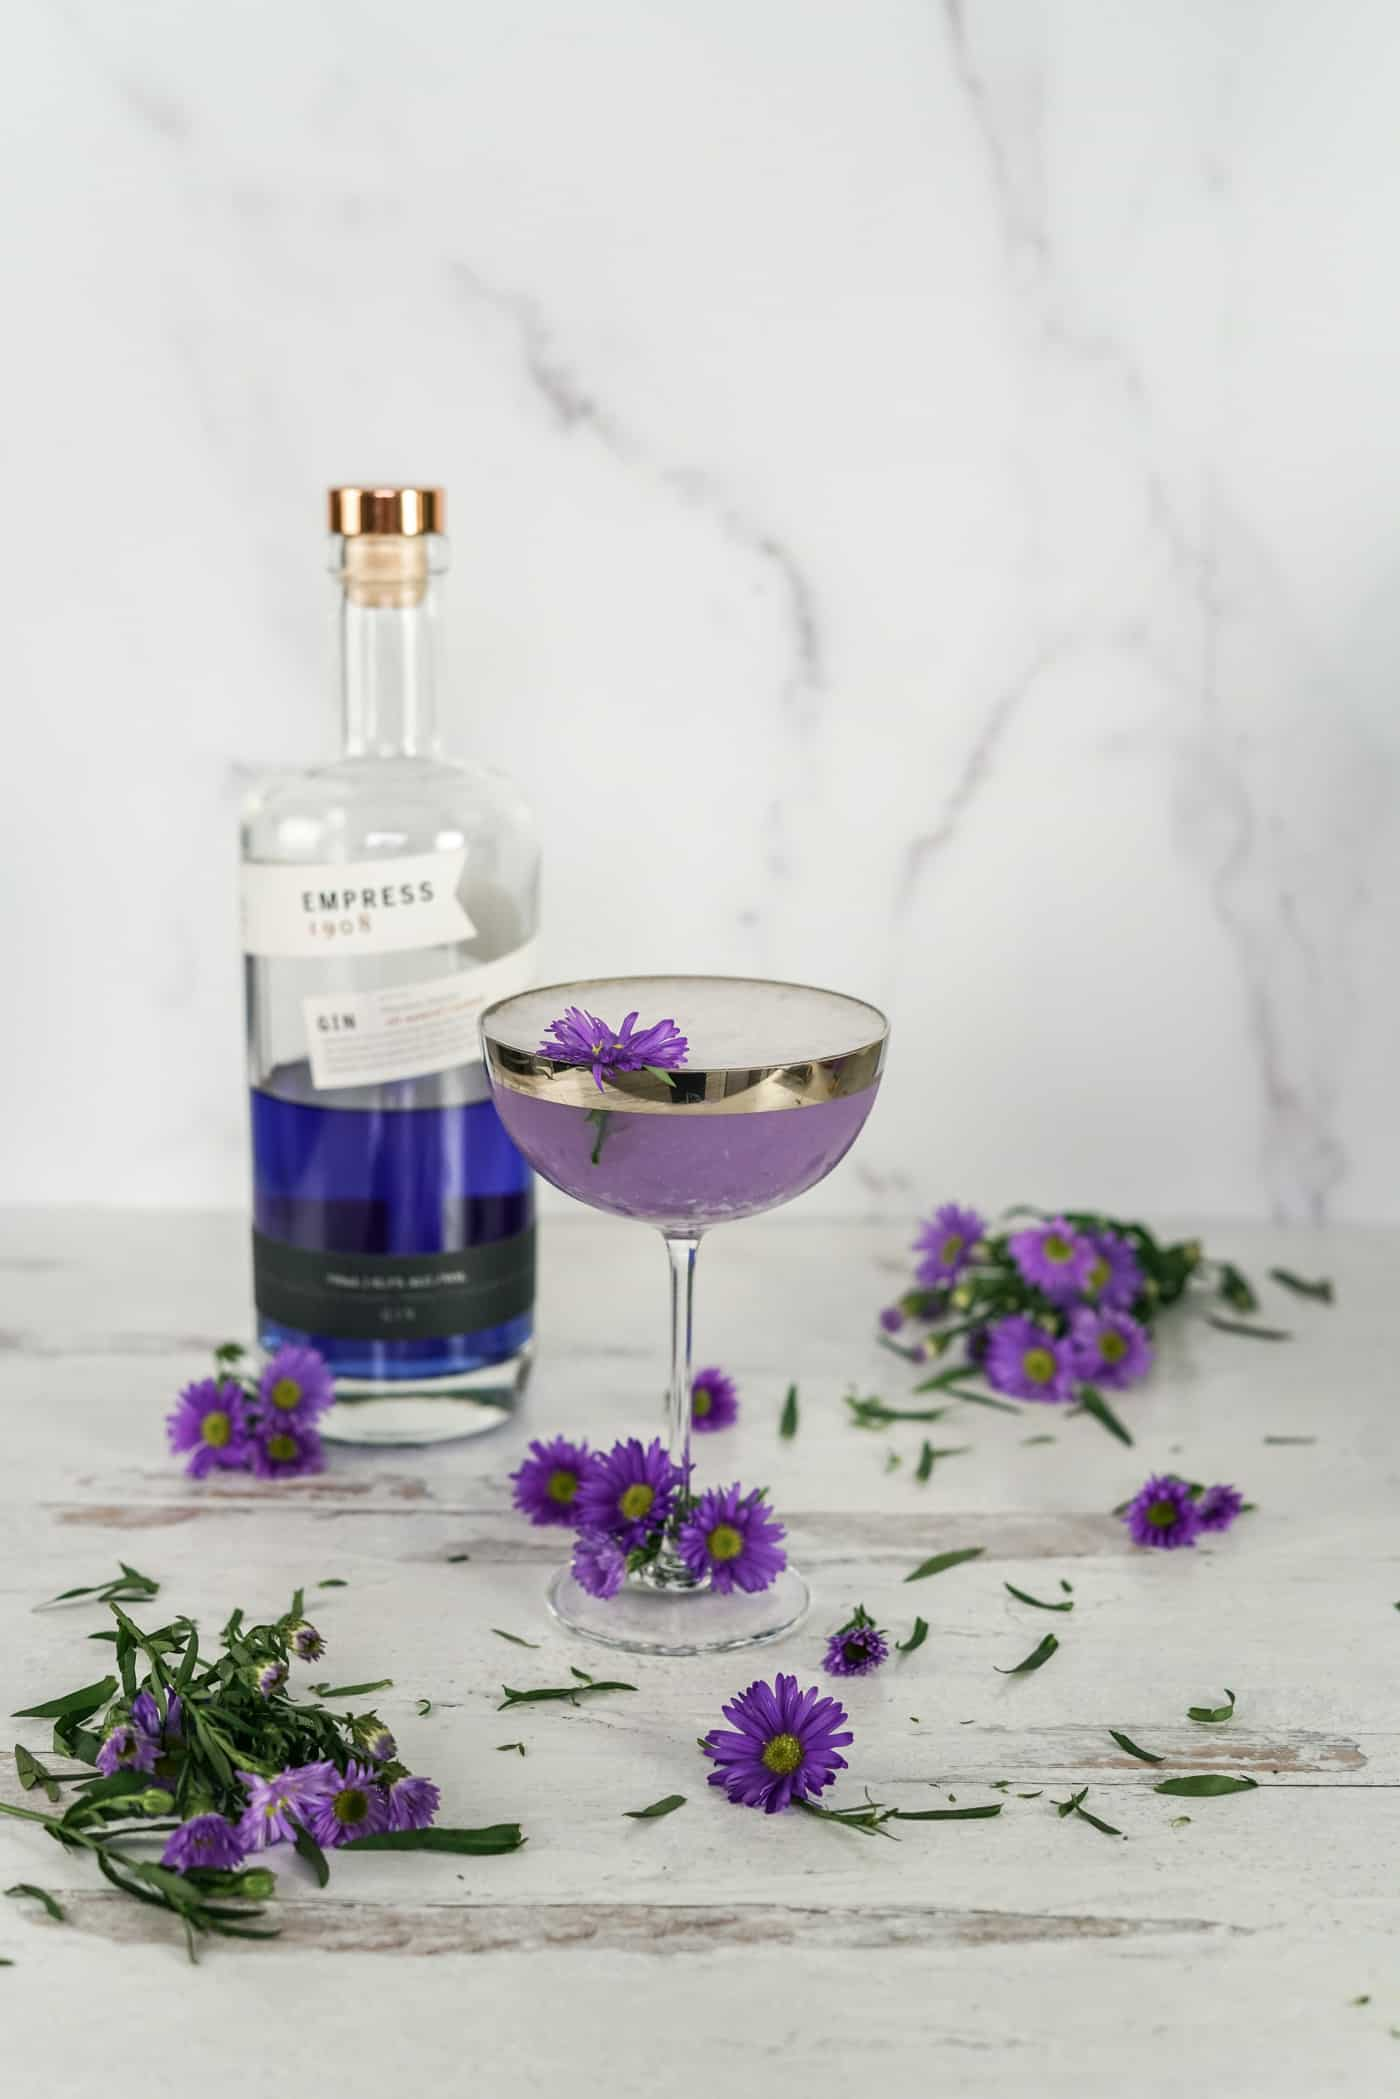 Empress Gin 1908 Cocktail